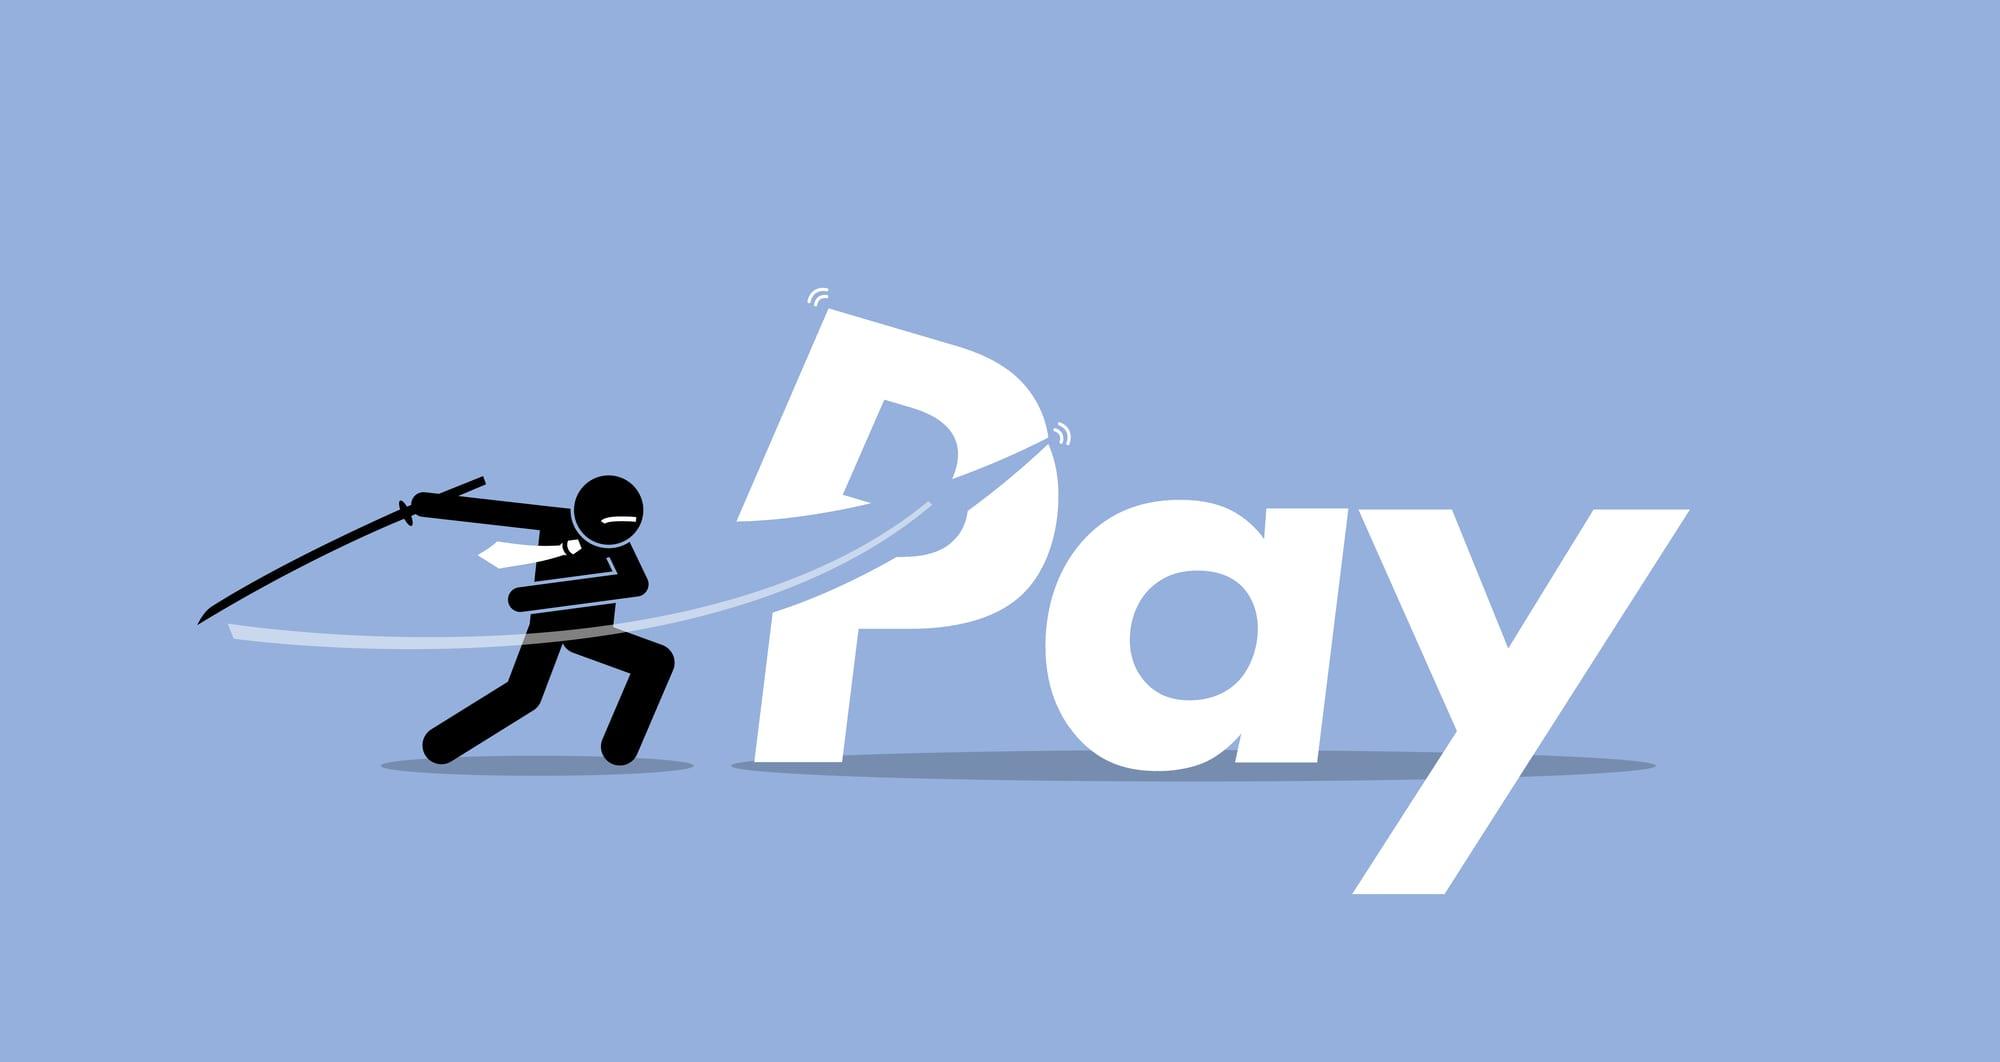 Slashing employee pay